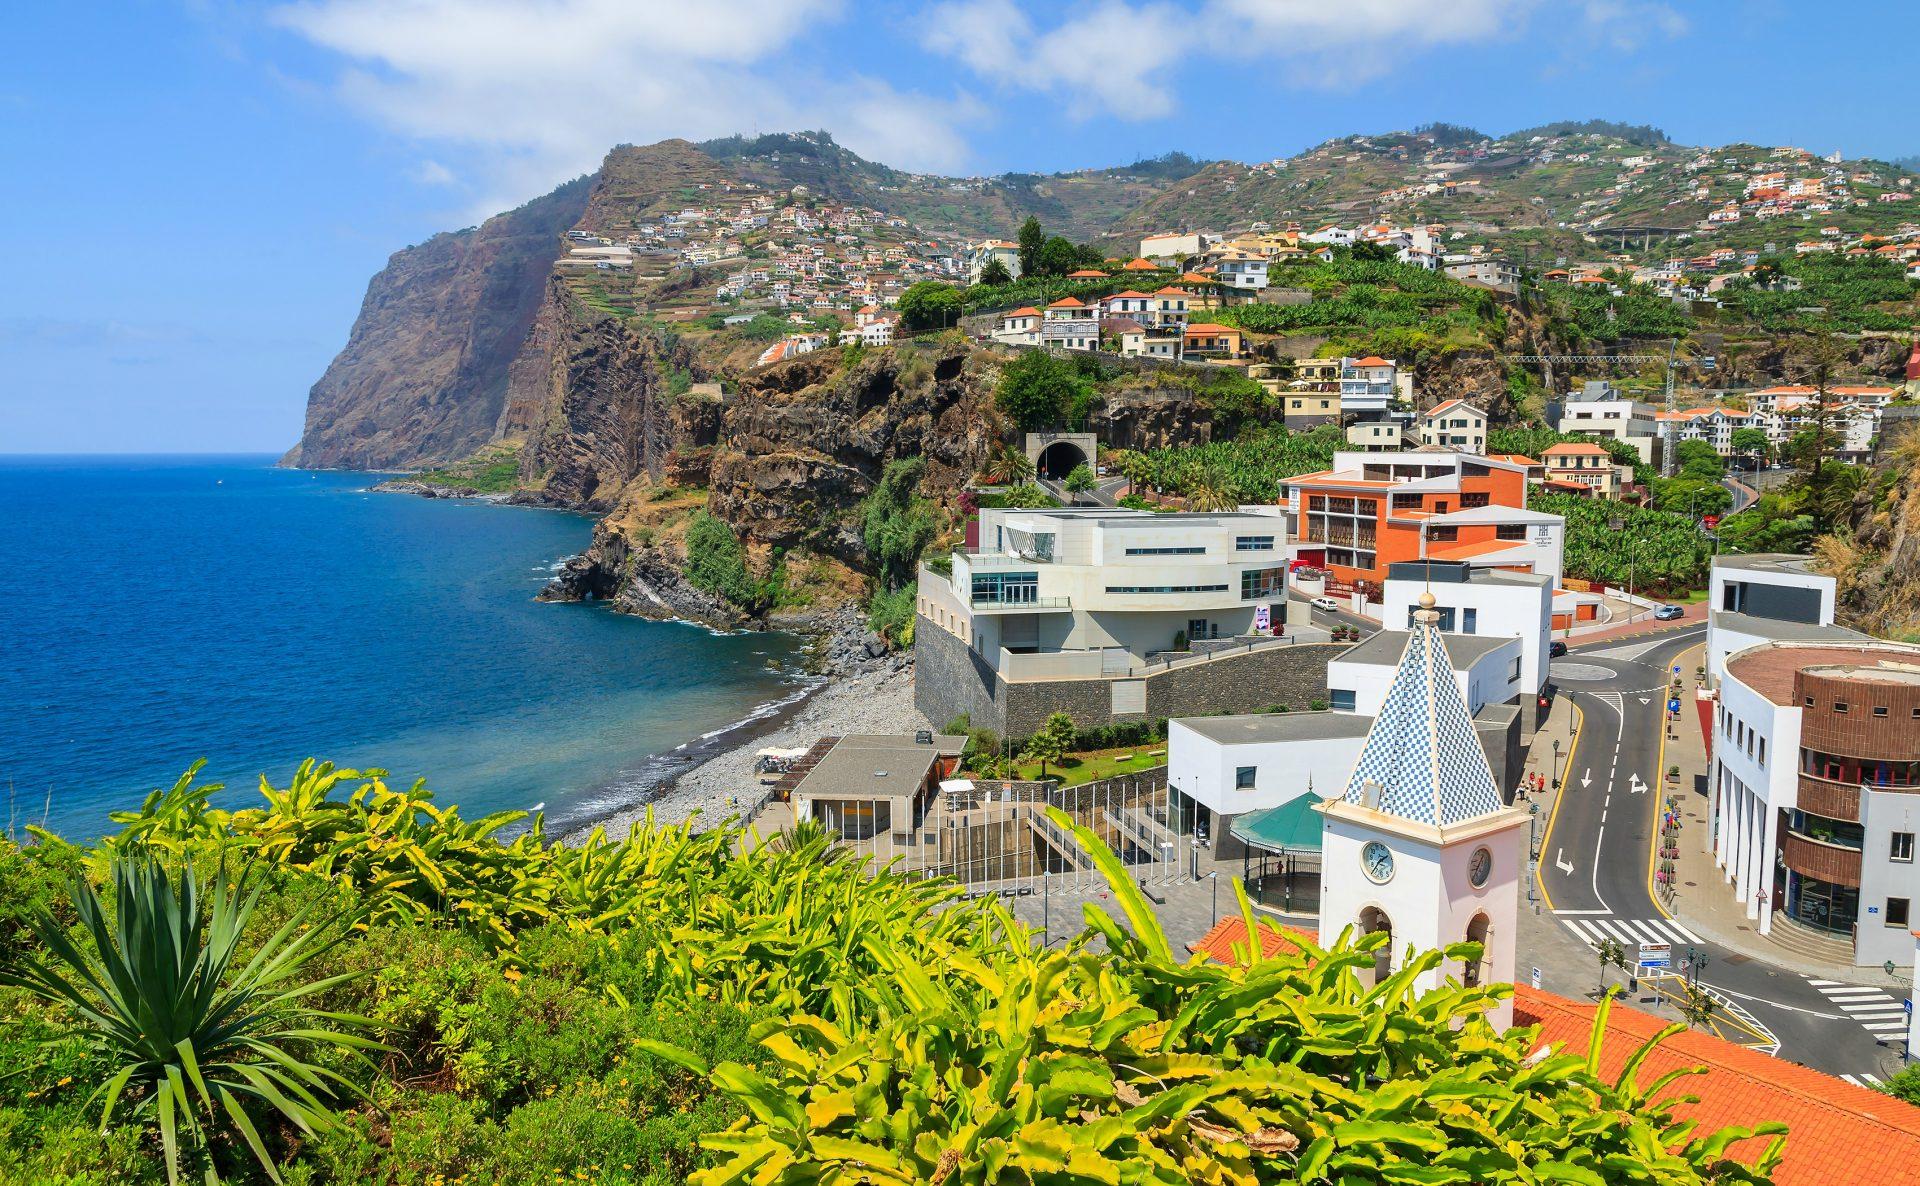 Quiet Portuguese charm beats the flashier Mediterranean fleshpots